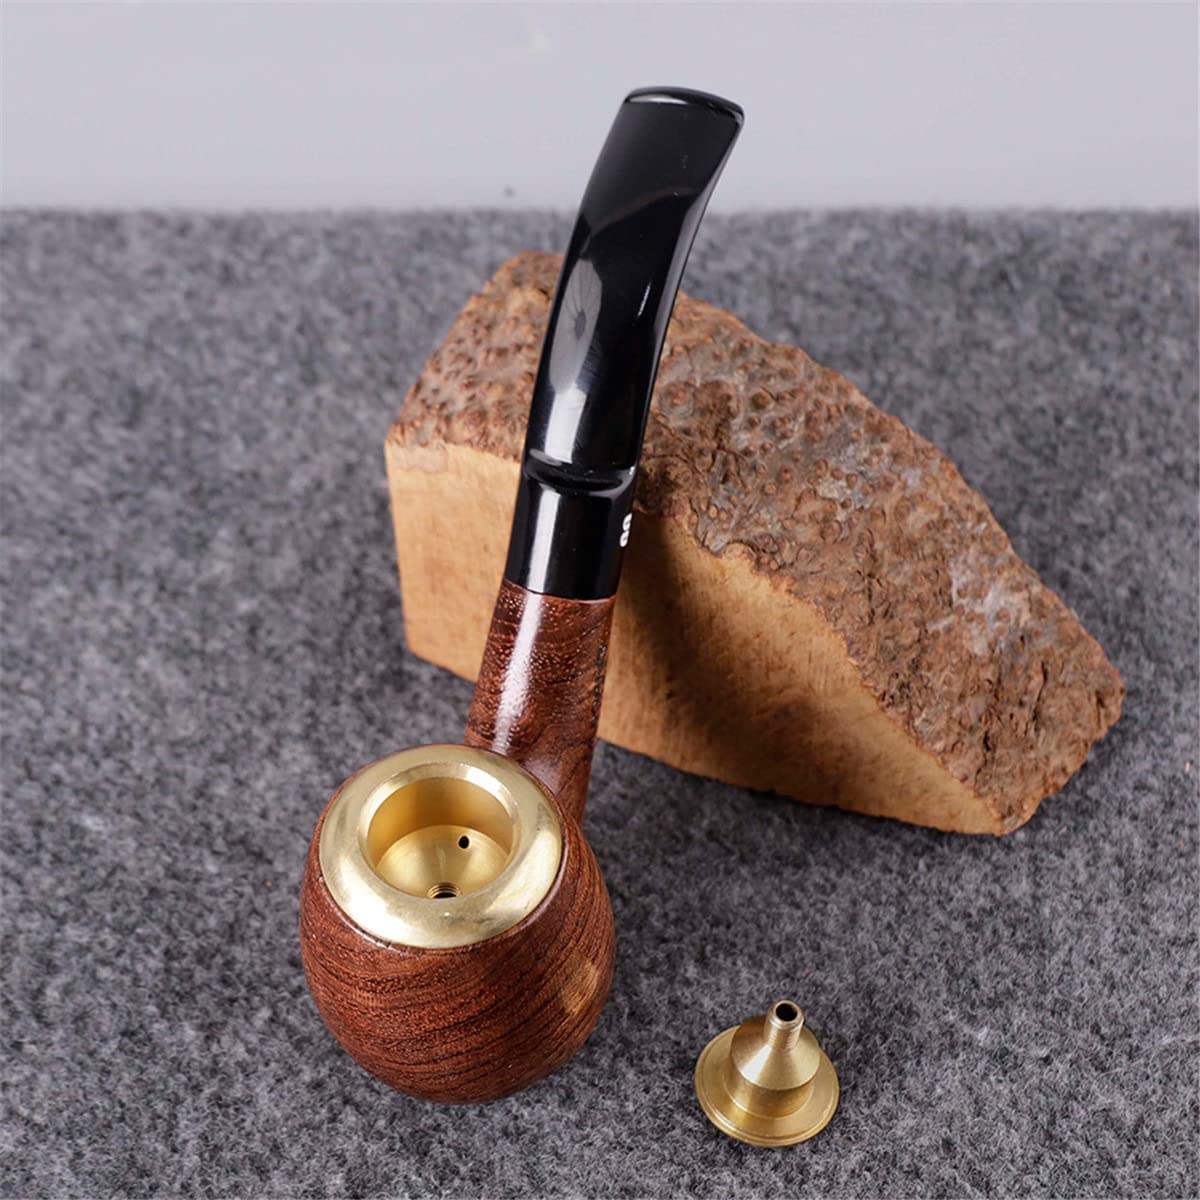 BILXXY Detachable Tobacco Smoking P Wooden Pipe Time sale Regular store